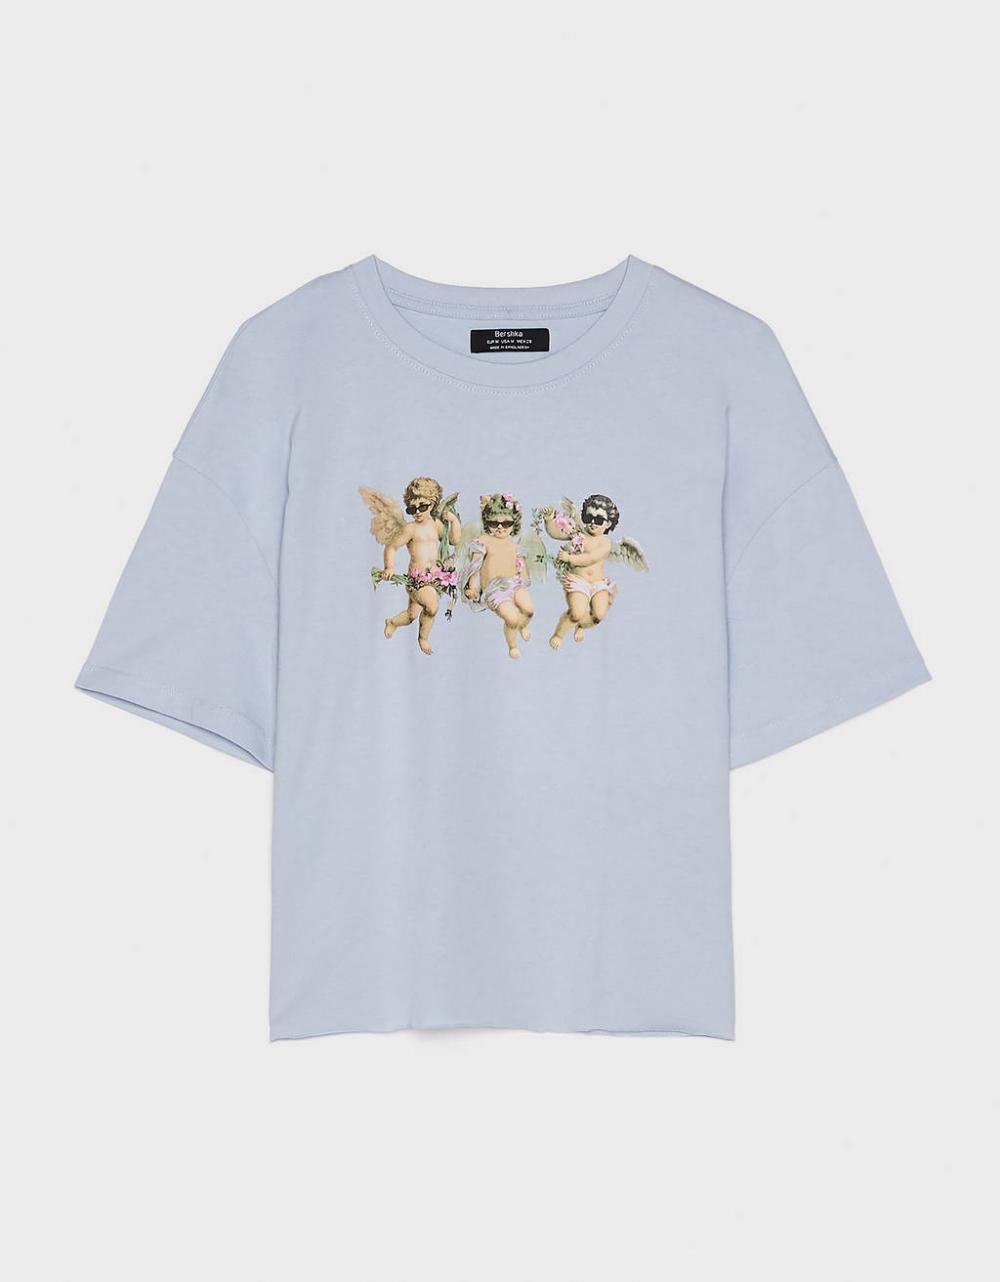 Angels T Shirt New Bershka United States Hemd Shirts T Shirt